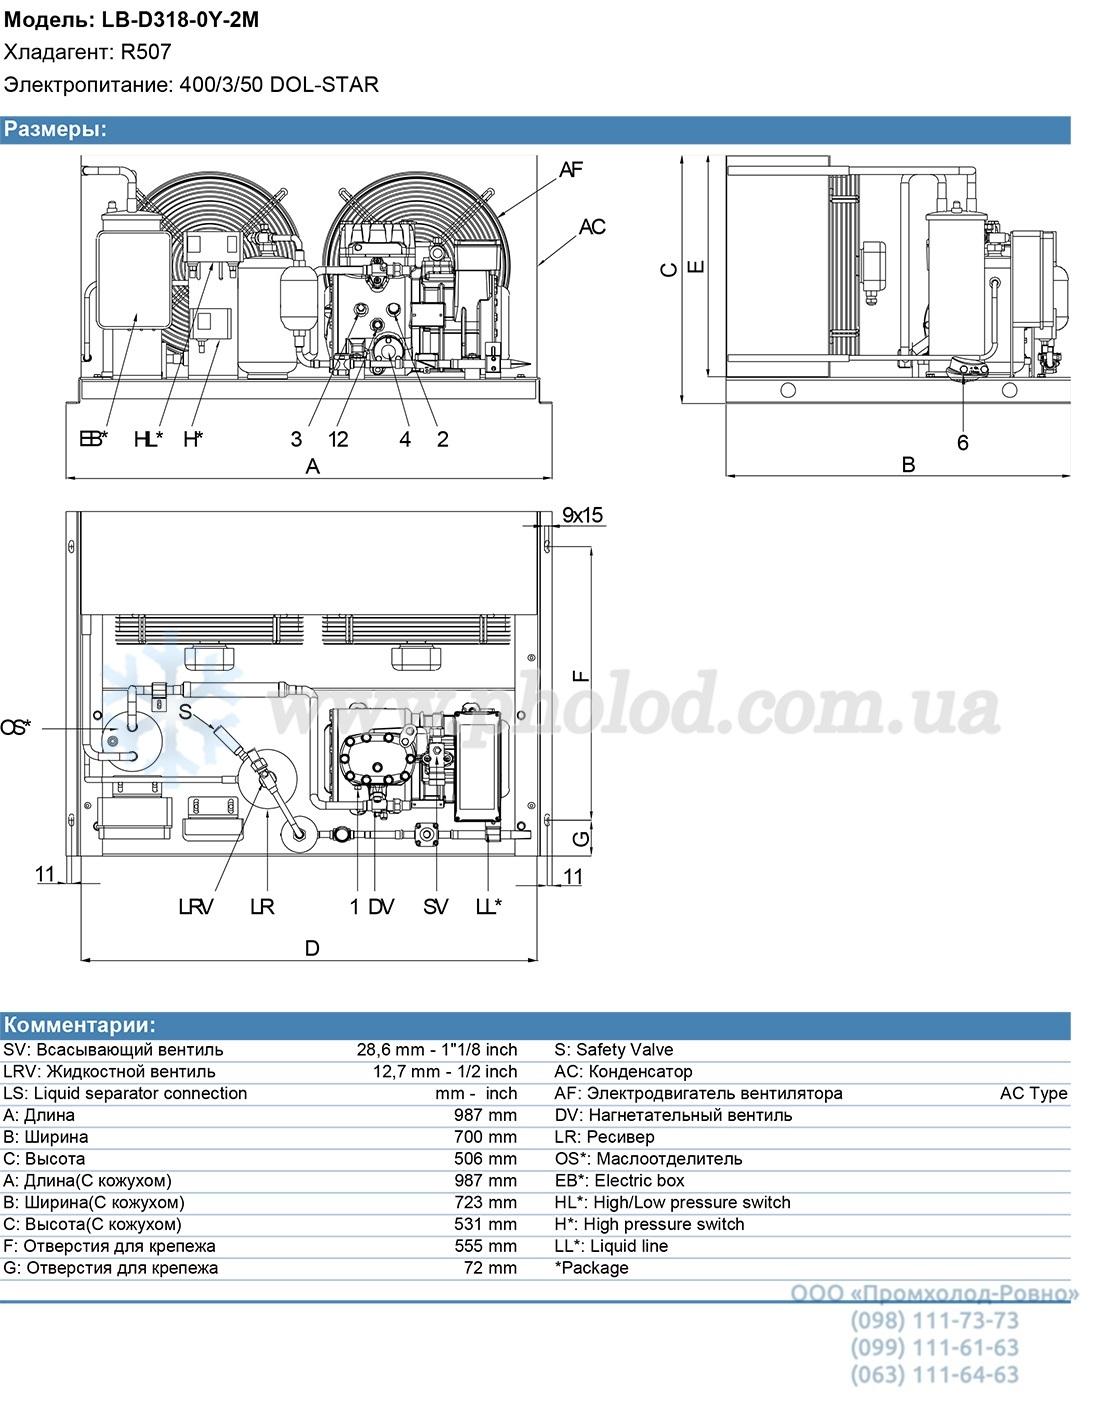 LB-D318-0Y-2M 3